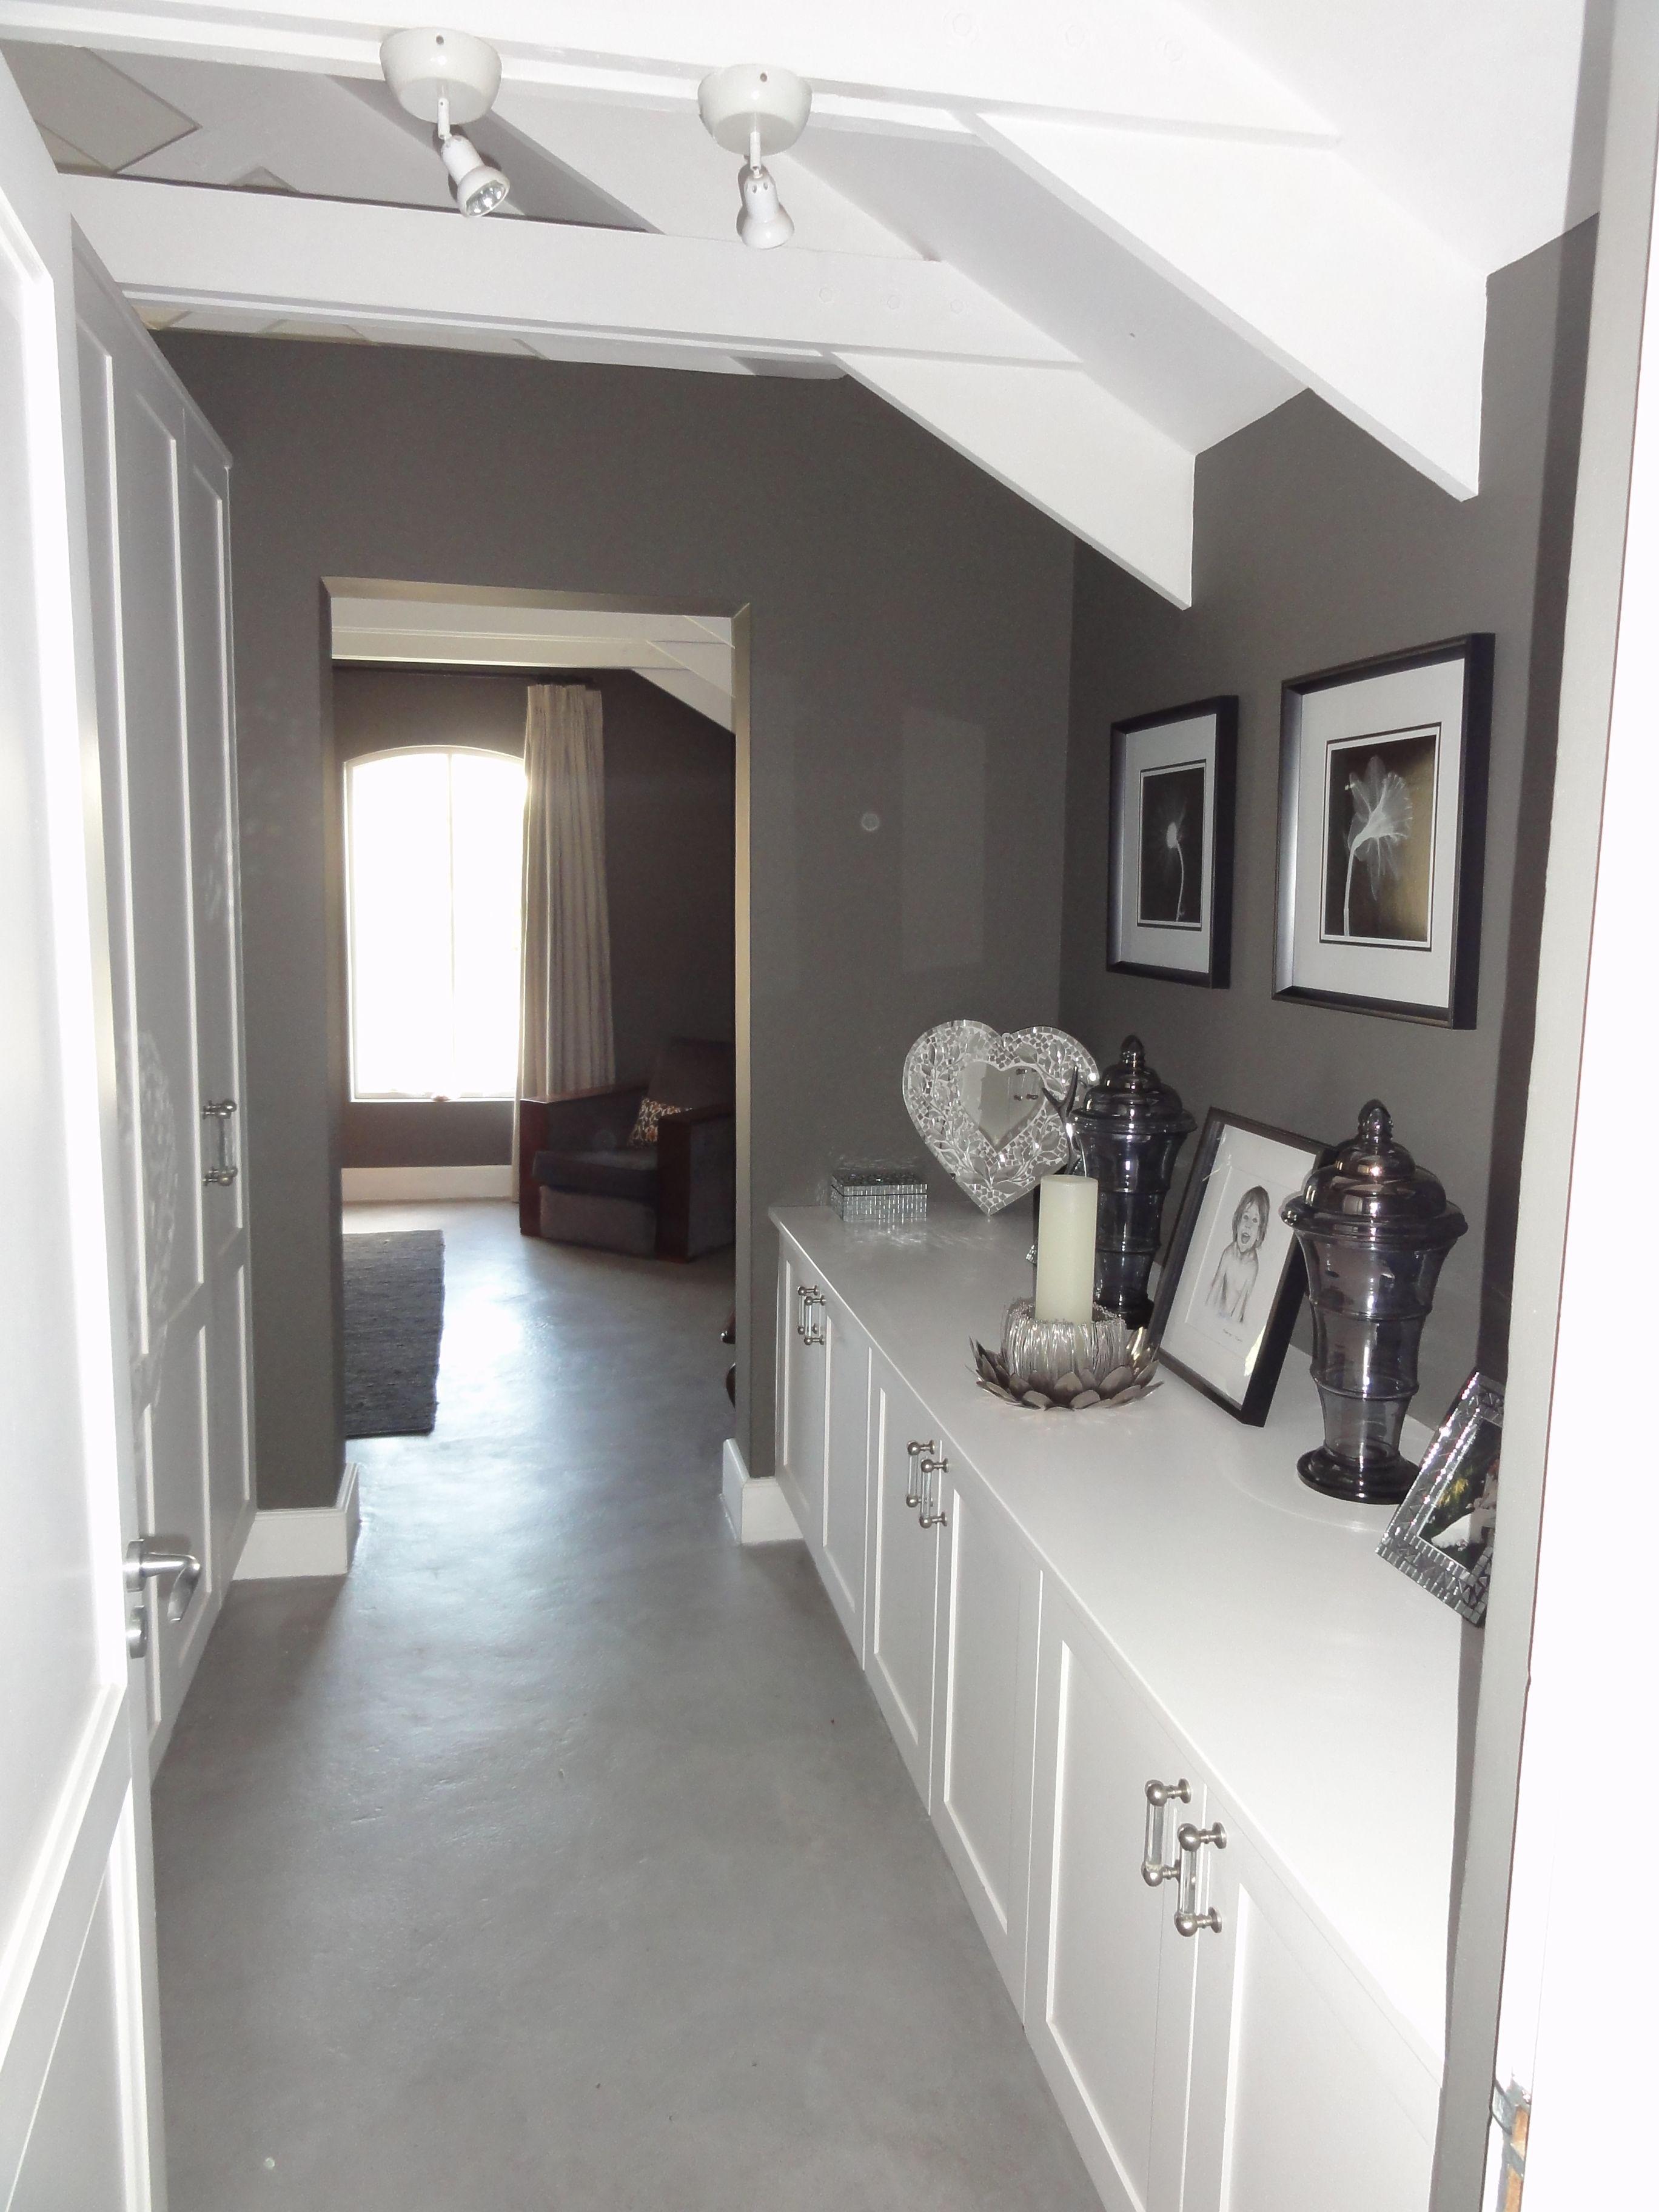 Best 2427 Passage To Main Bedroom Home Build A Closet Interior 400 x 300